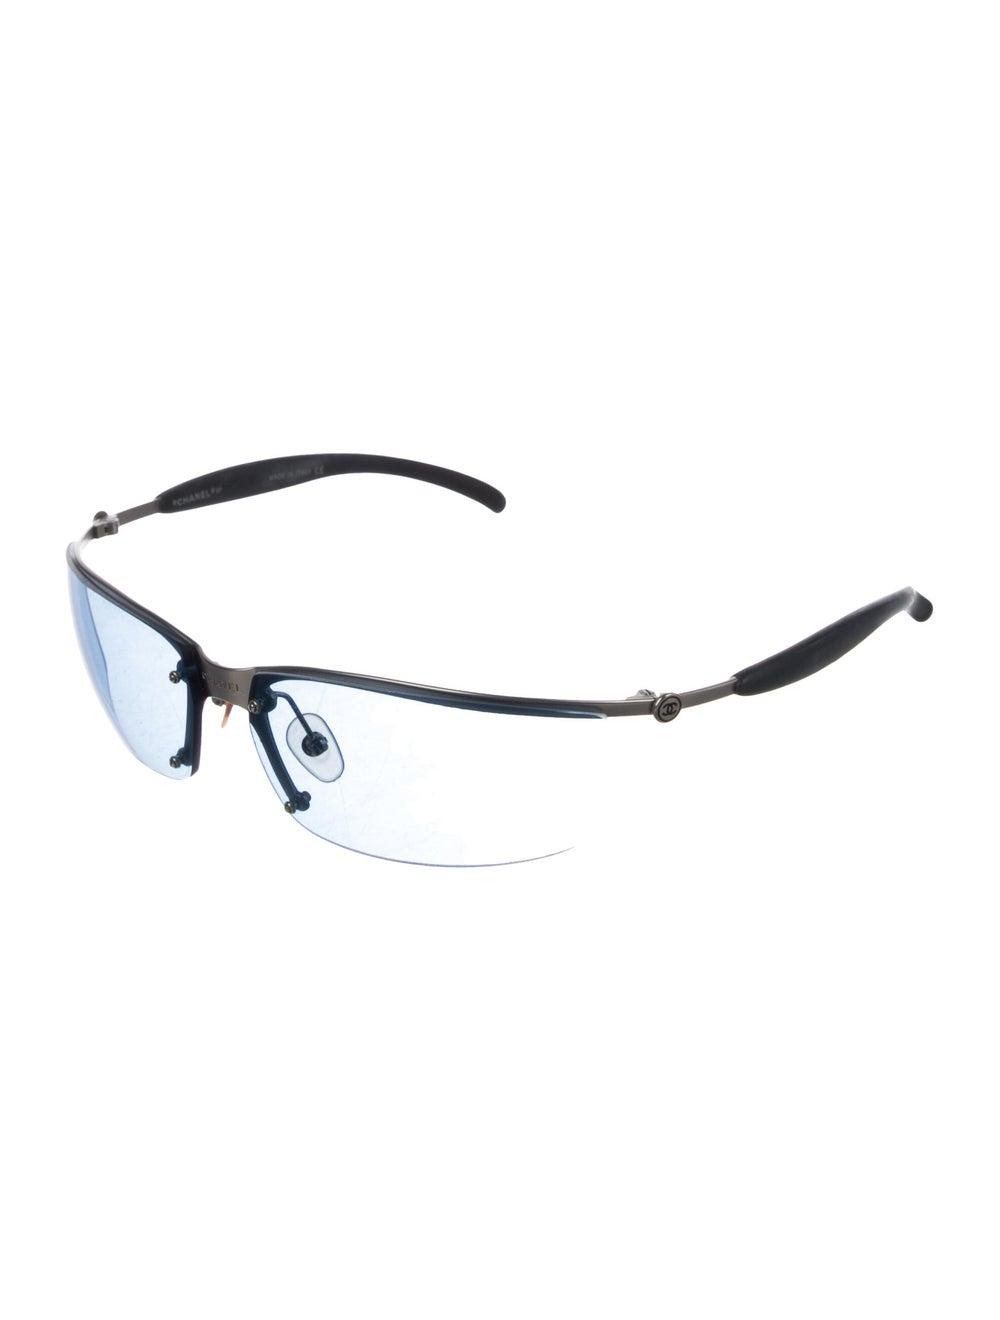 Chanel Rimless CC Sunglasses Grey - image 2